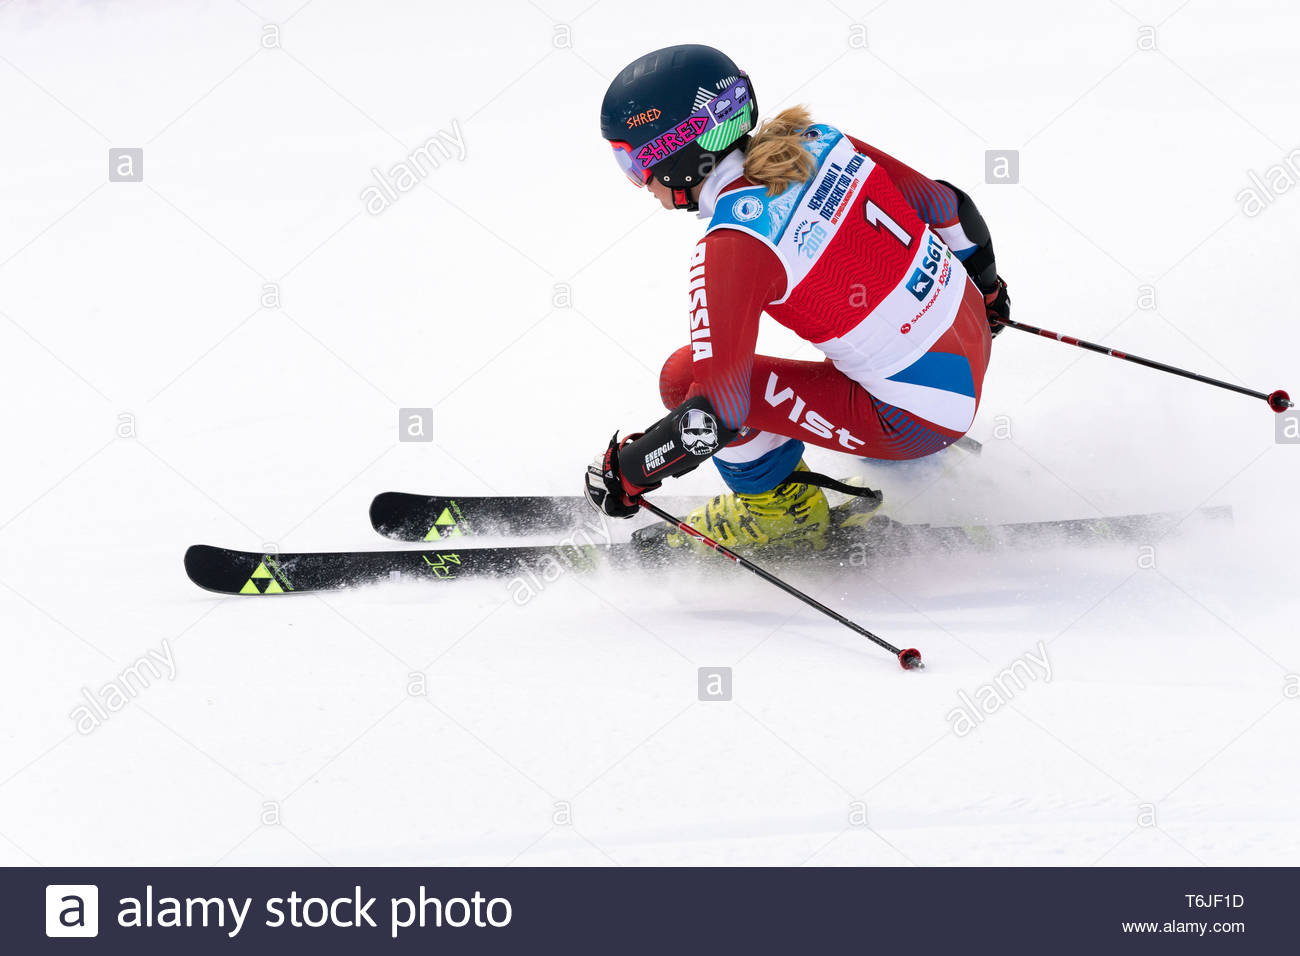 KAMCHATKA, RUSSIA - APRIL 2, 2019: Mountain skier Kryukova Kristina (Kamchatka Peninsula) skiing down mount. International Ski Federation, Championshi - Stock Image